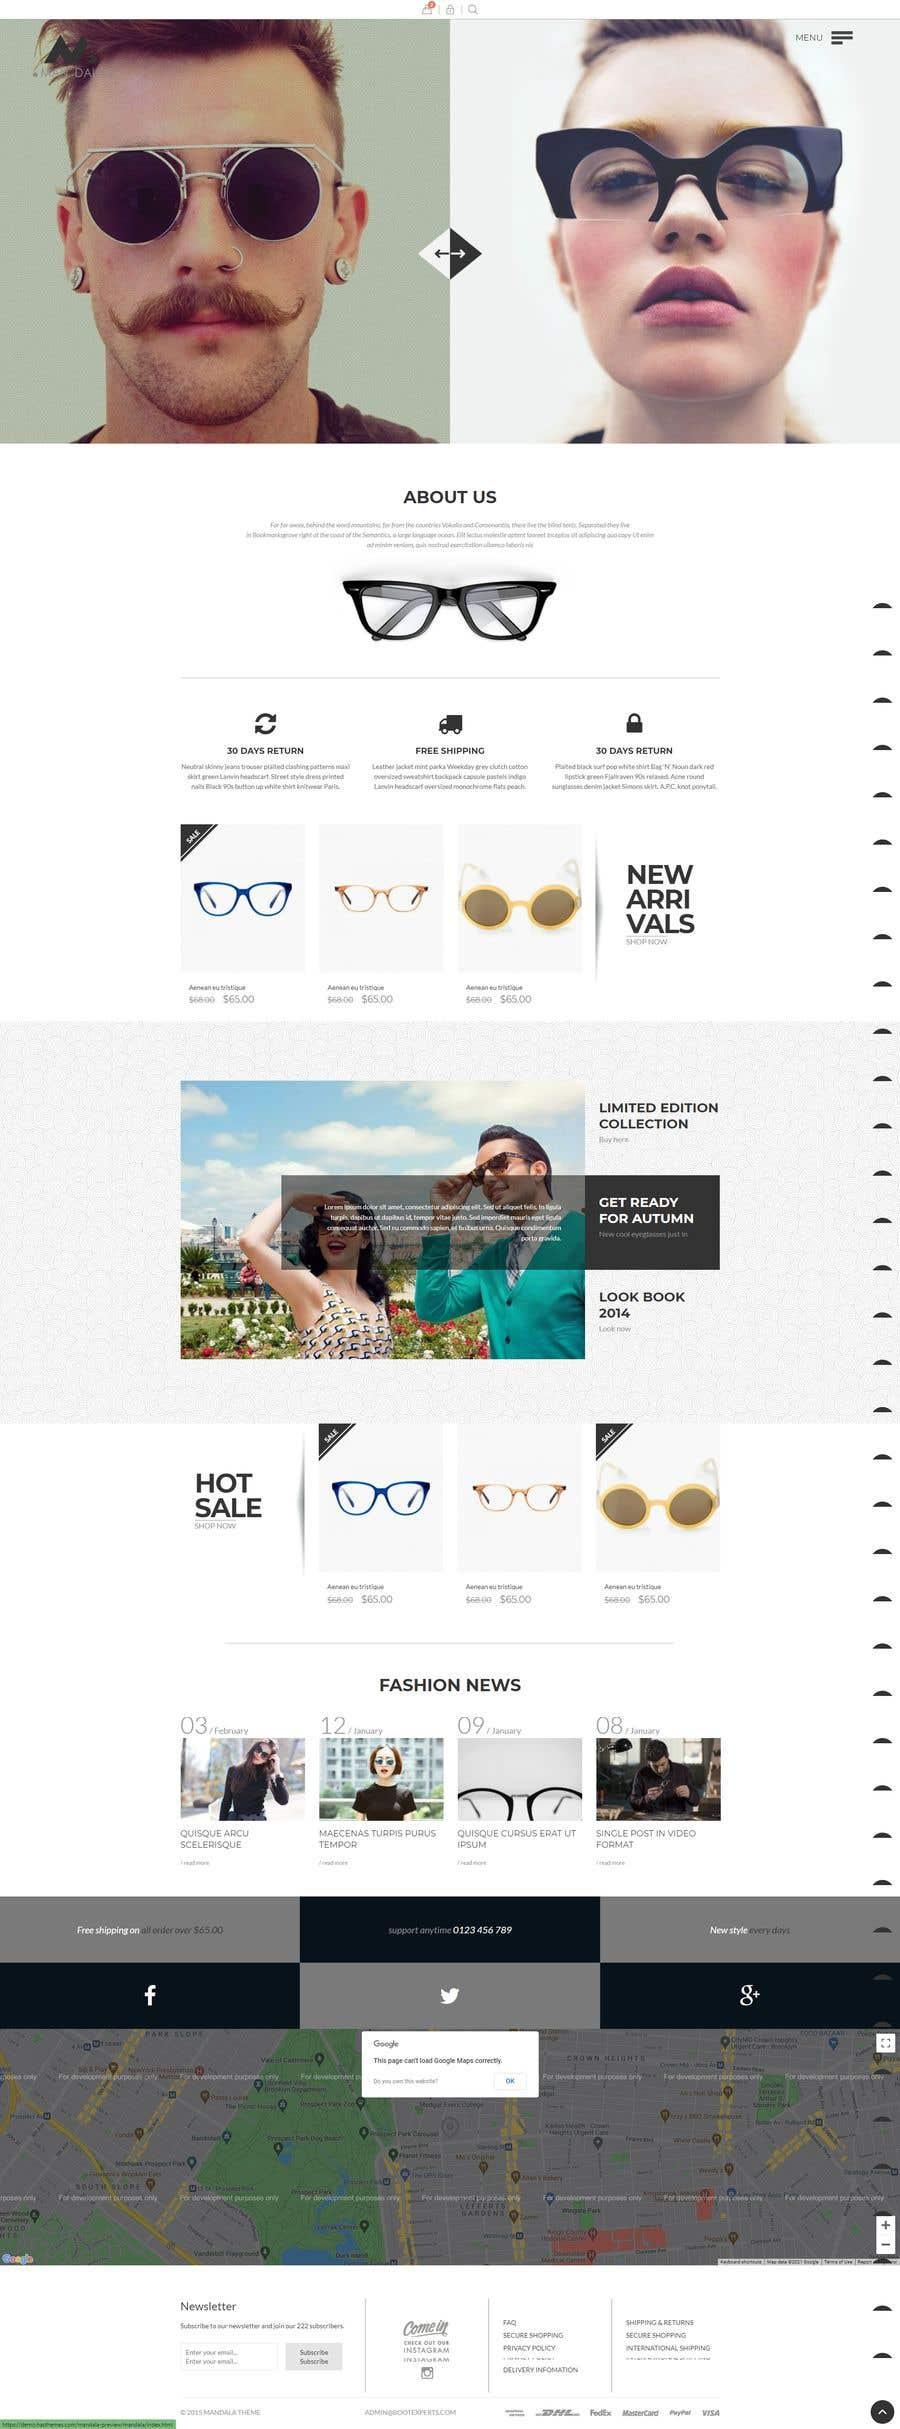 Konkurrenceindlæg #                                        19                                      for                                         Design an online shopping page for my website